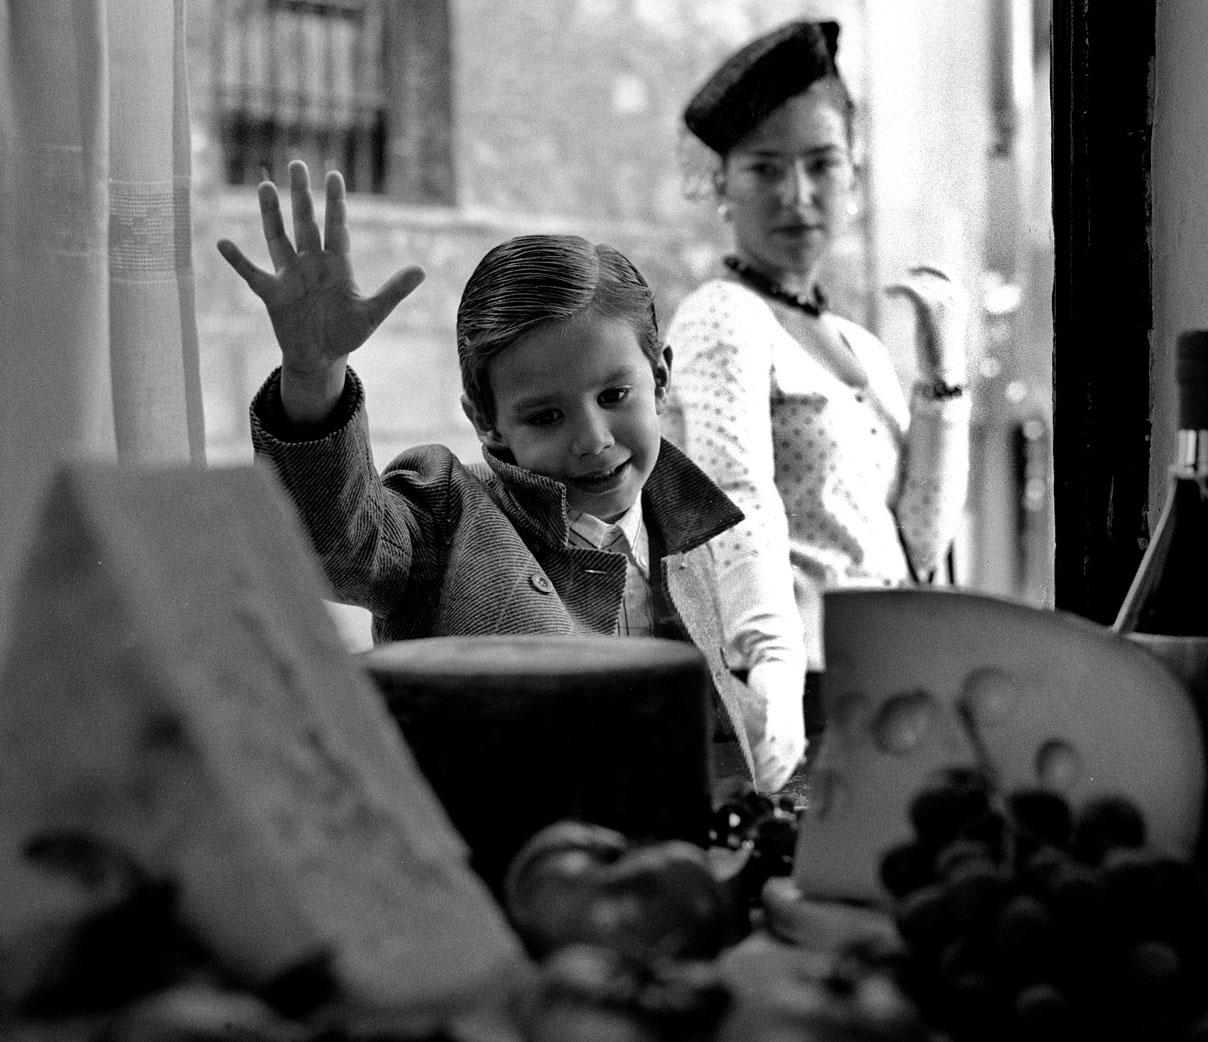 IL TEMPIETTO deco restaurantes - alimentación - david muncharaz, FOTÓGRAFO